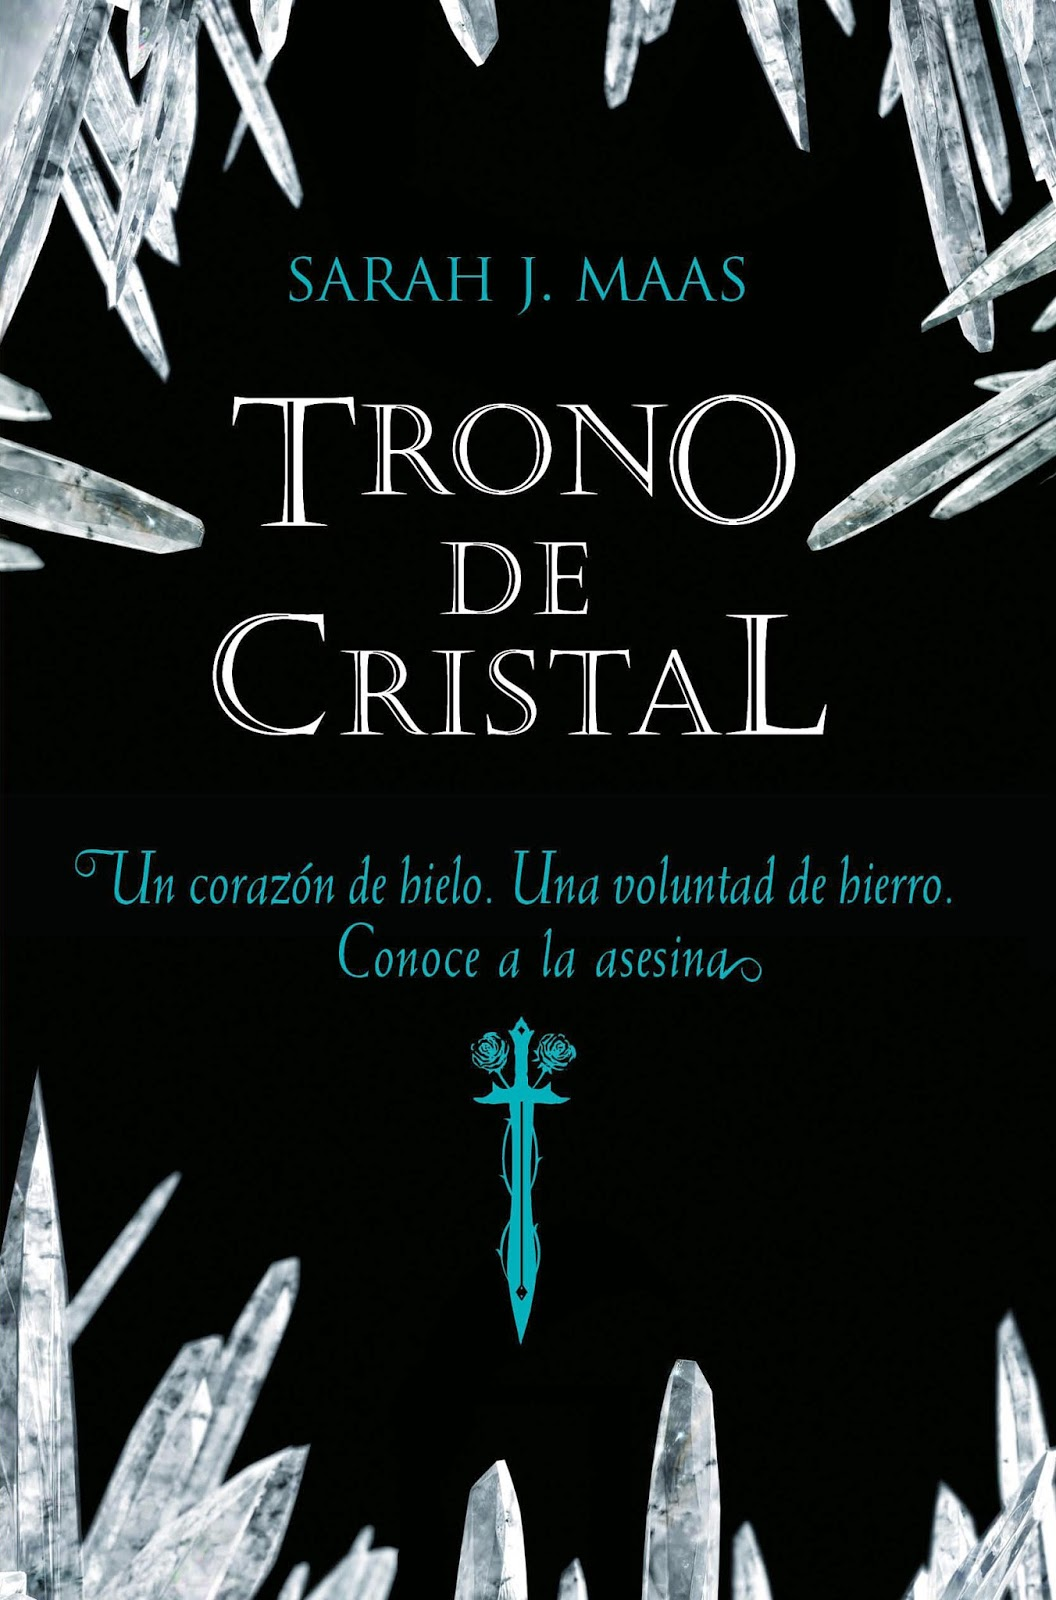 http://www.amazon.es/Trono-cristal-Alfaguara-Juvenil-Sarah/dp/8420403679/ref=sr_1_1?s=books&ie=UTF8&qid=1402992499&sr=1-1&keywords=trono+de+cristal